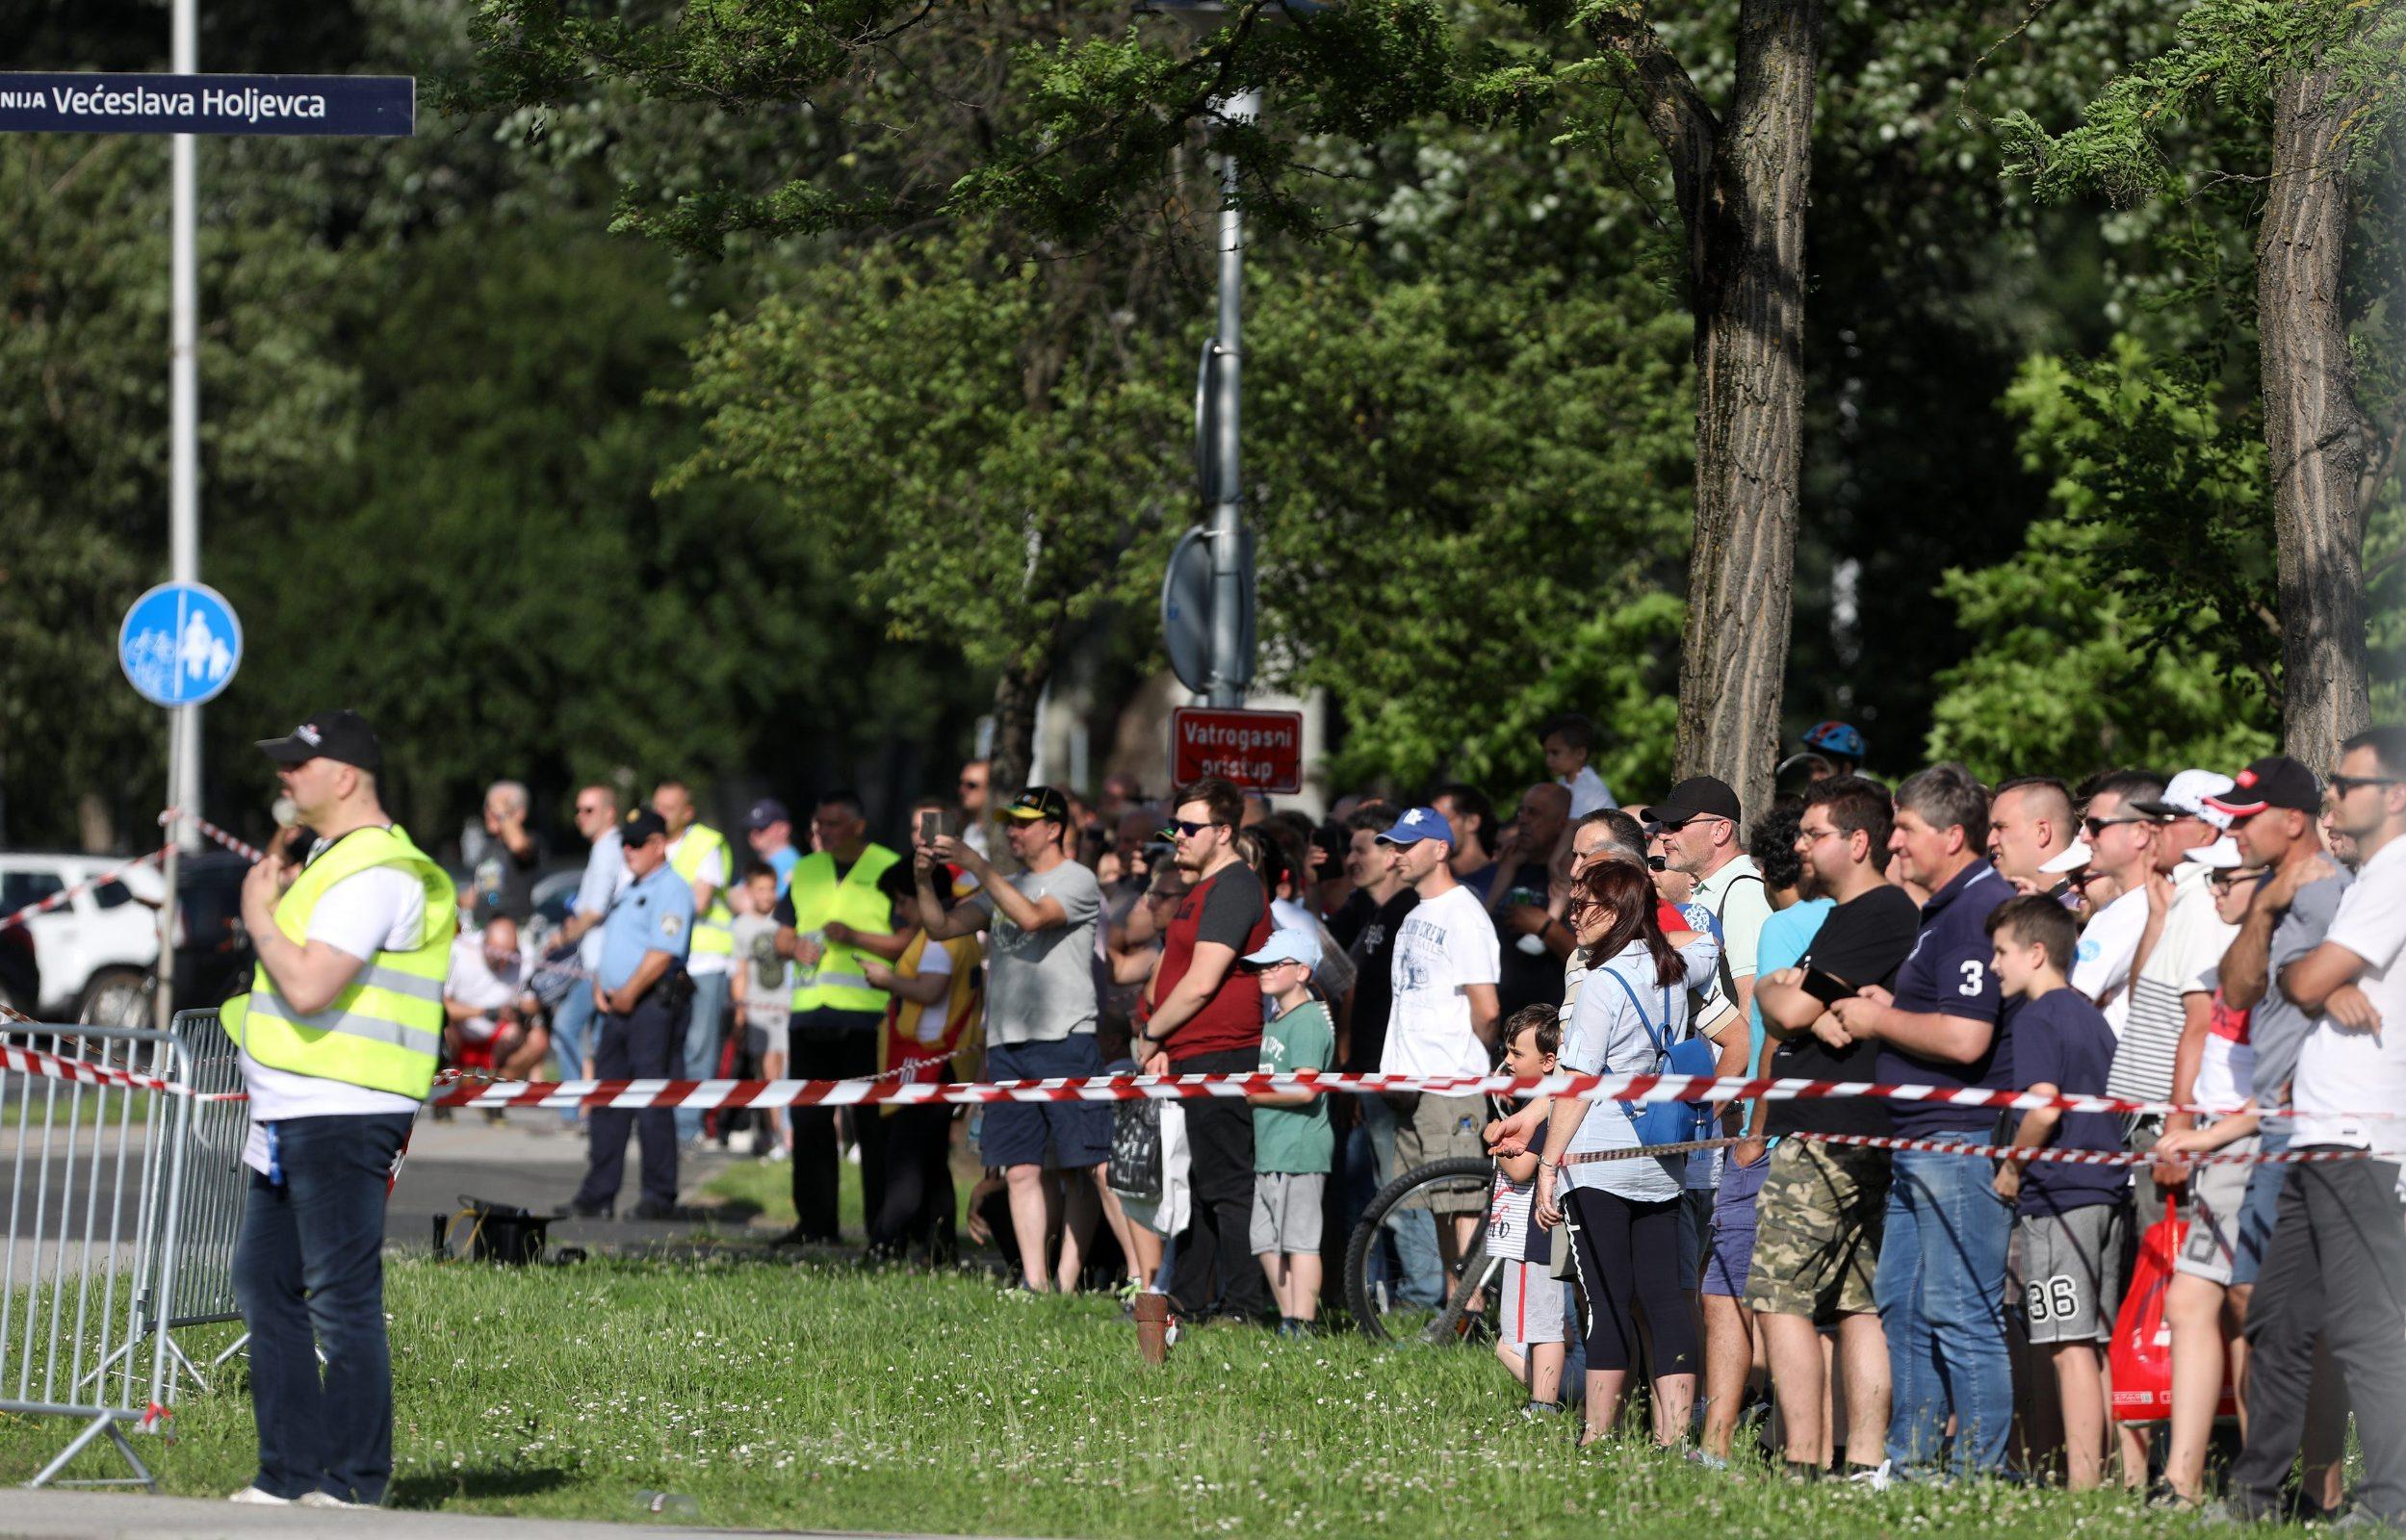 Zagreb, 070619. Ina, Velesajam. Utrka Ina Delta rally, brzinski ispit oko parkiralista na Velesajmu. Foto: Ranko Suvar / CROPIX